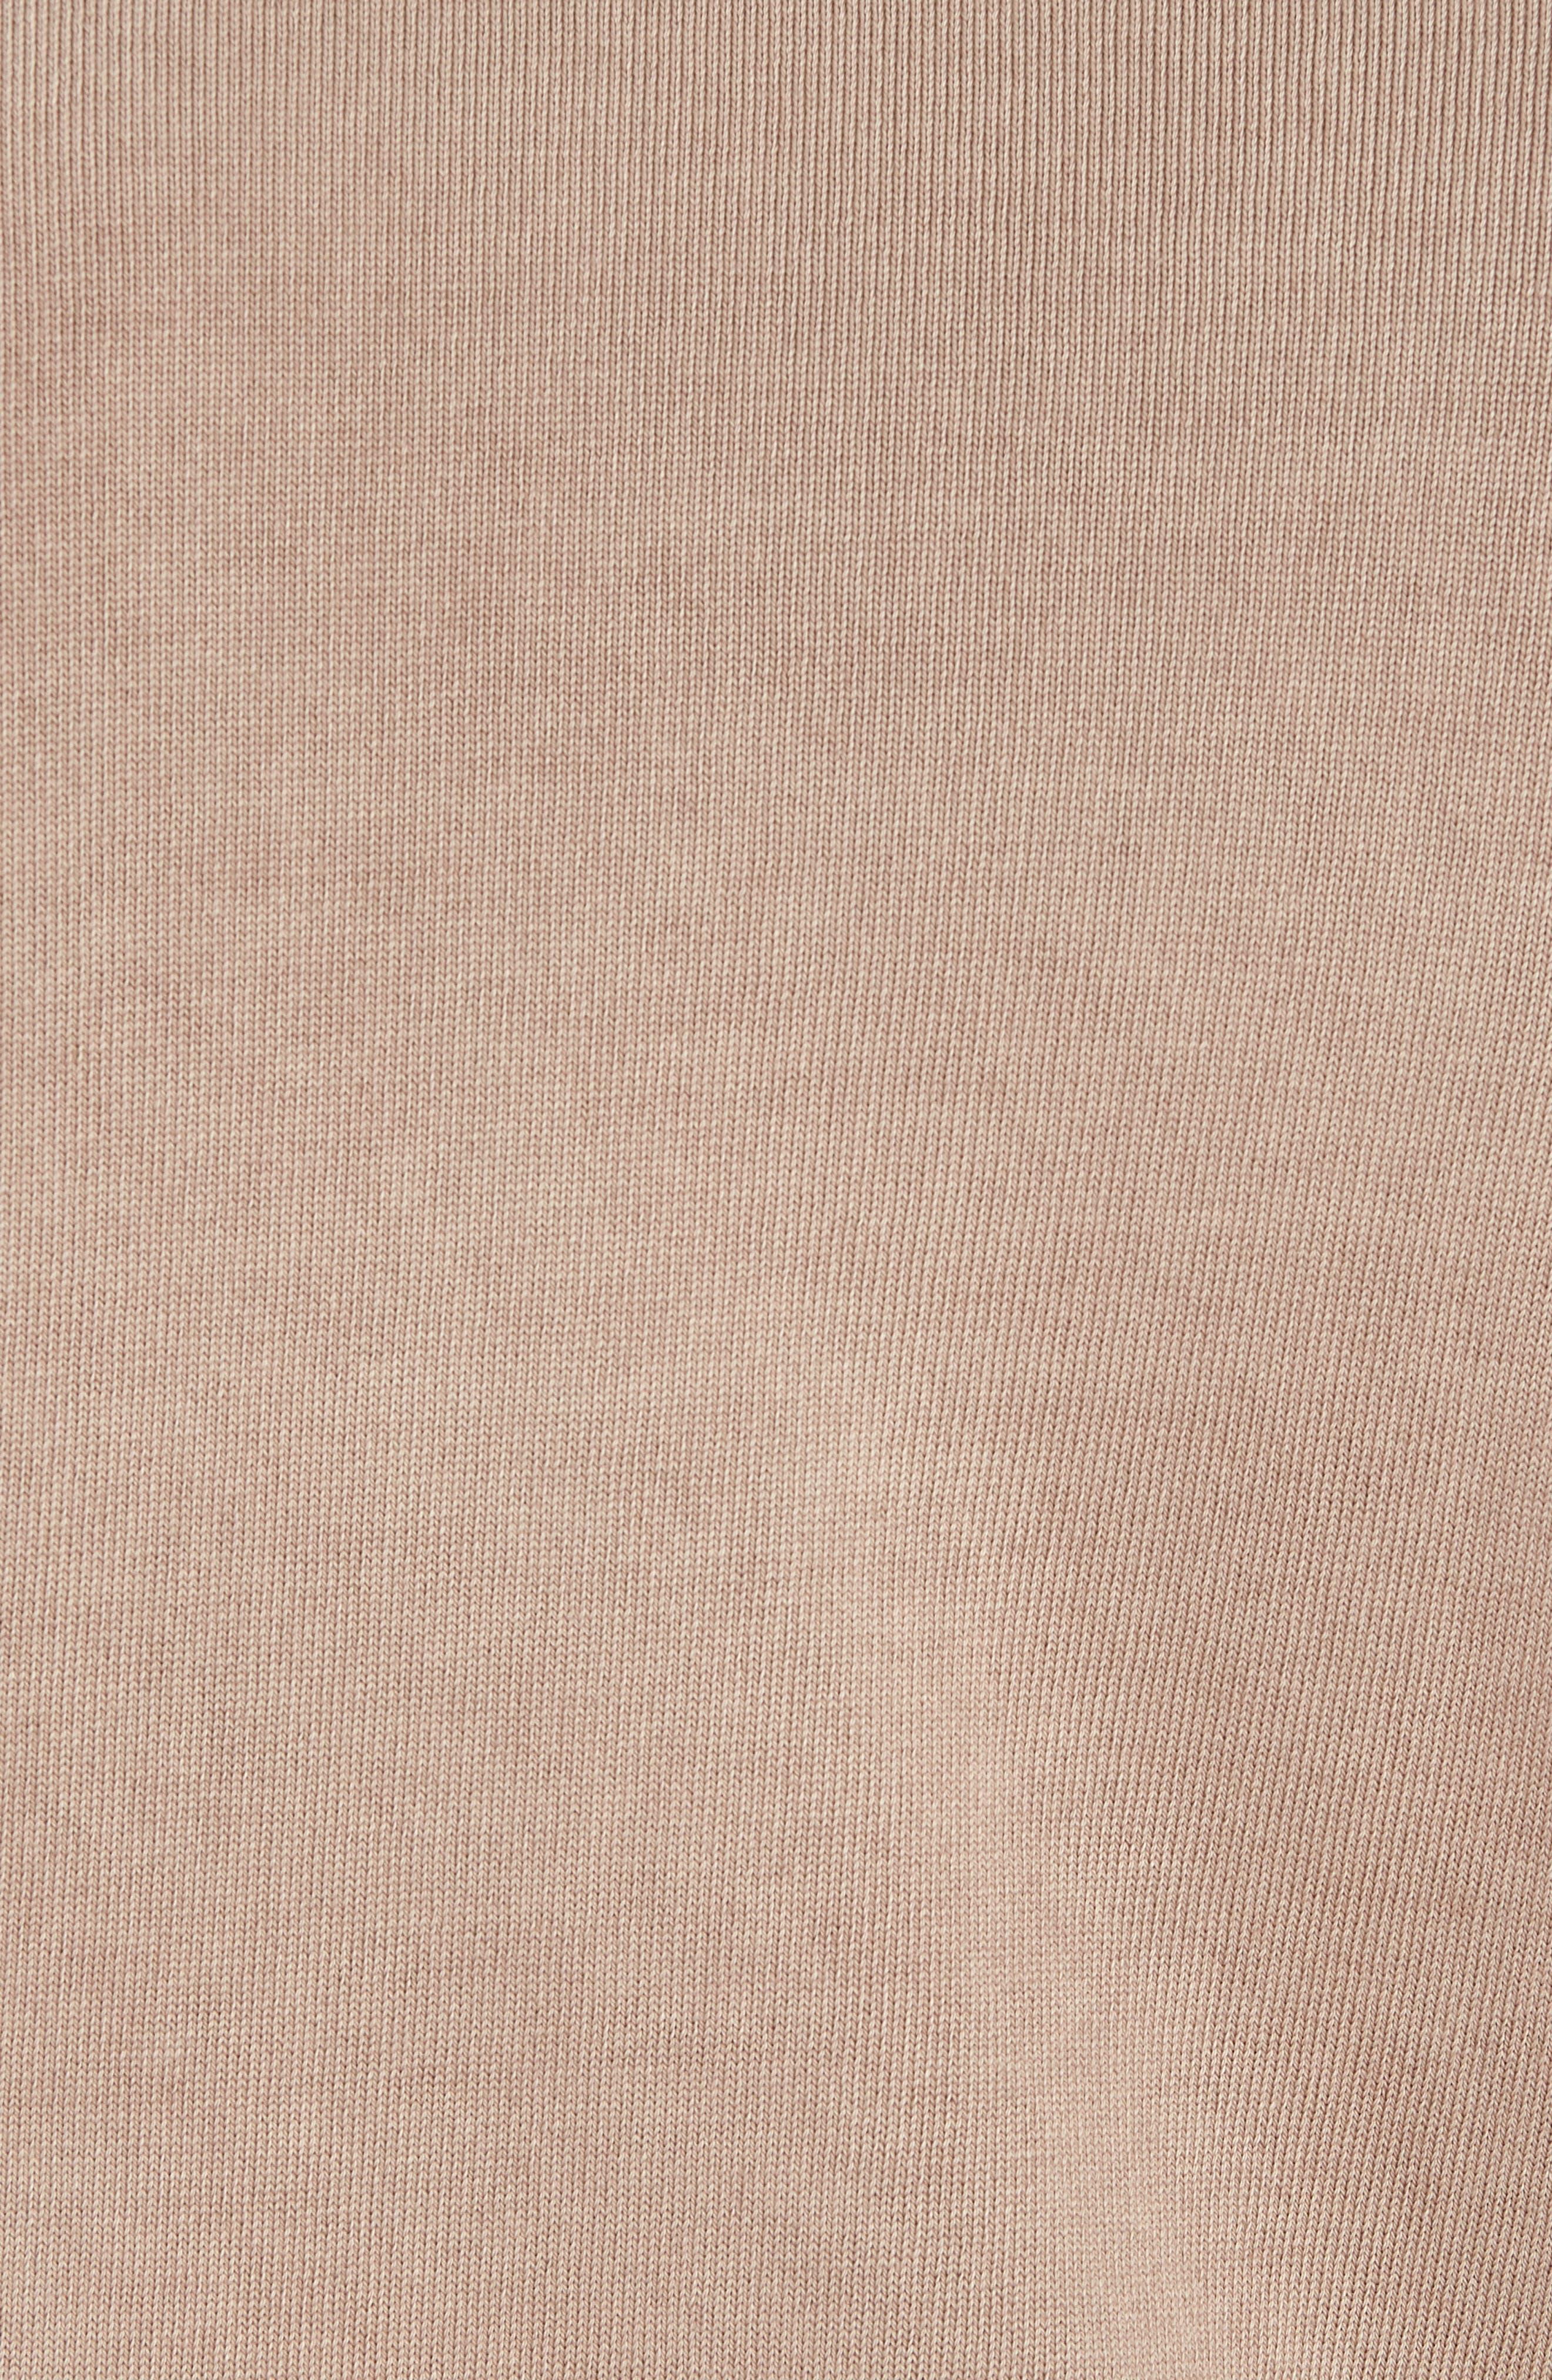 Stonewash Cotton Sweatshirt,                             Alternate thumbnail 5, color,